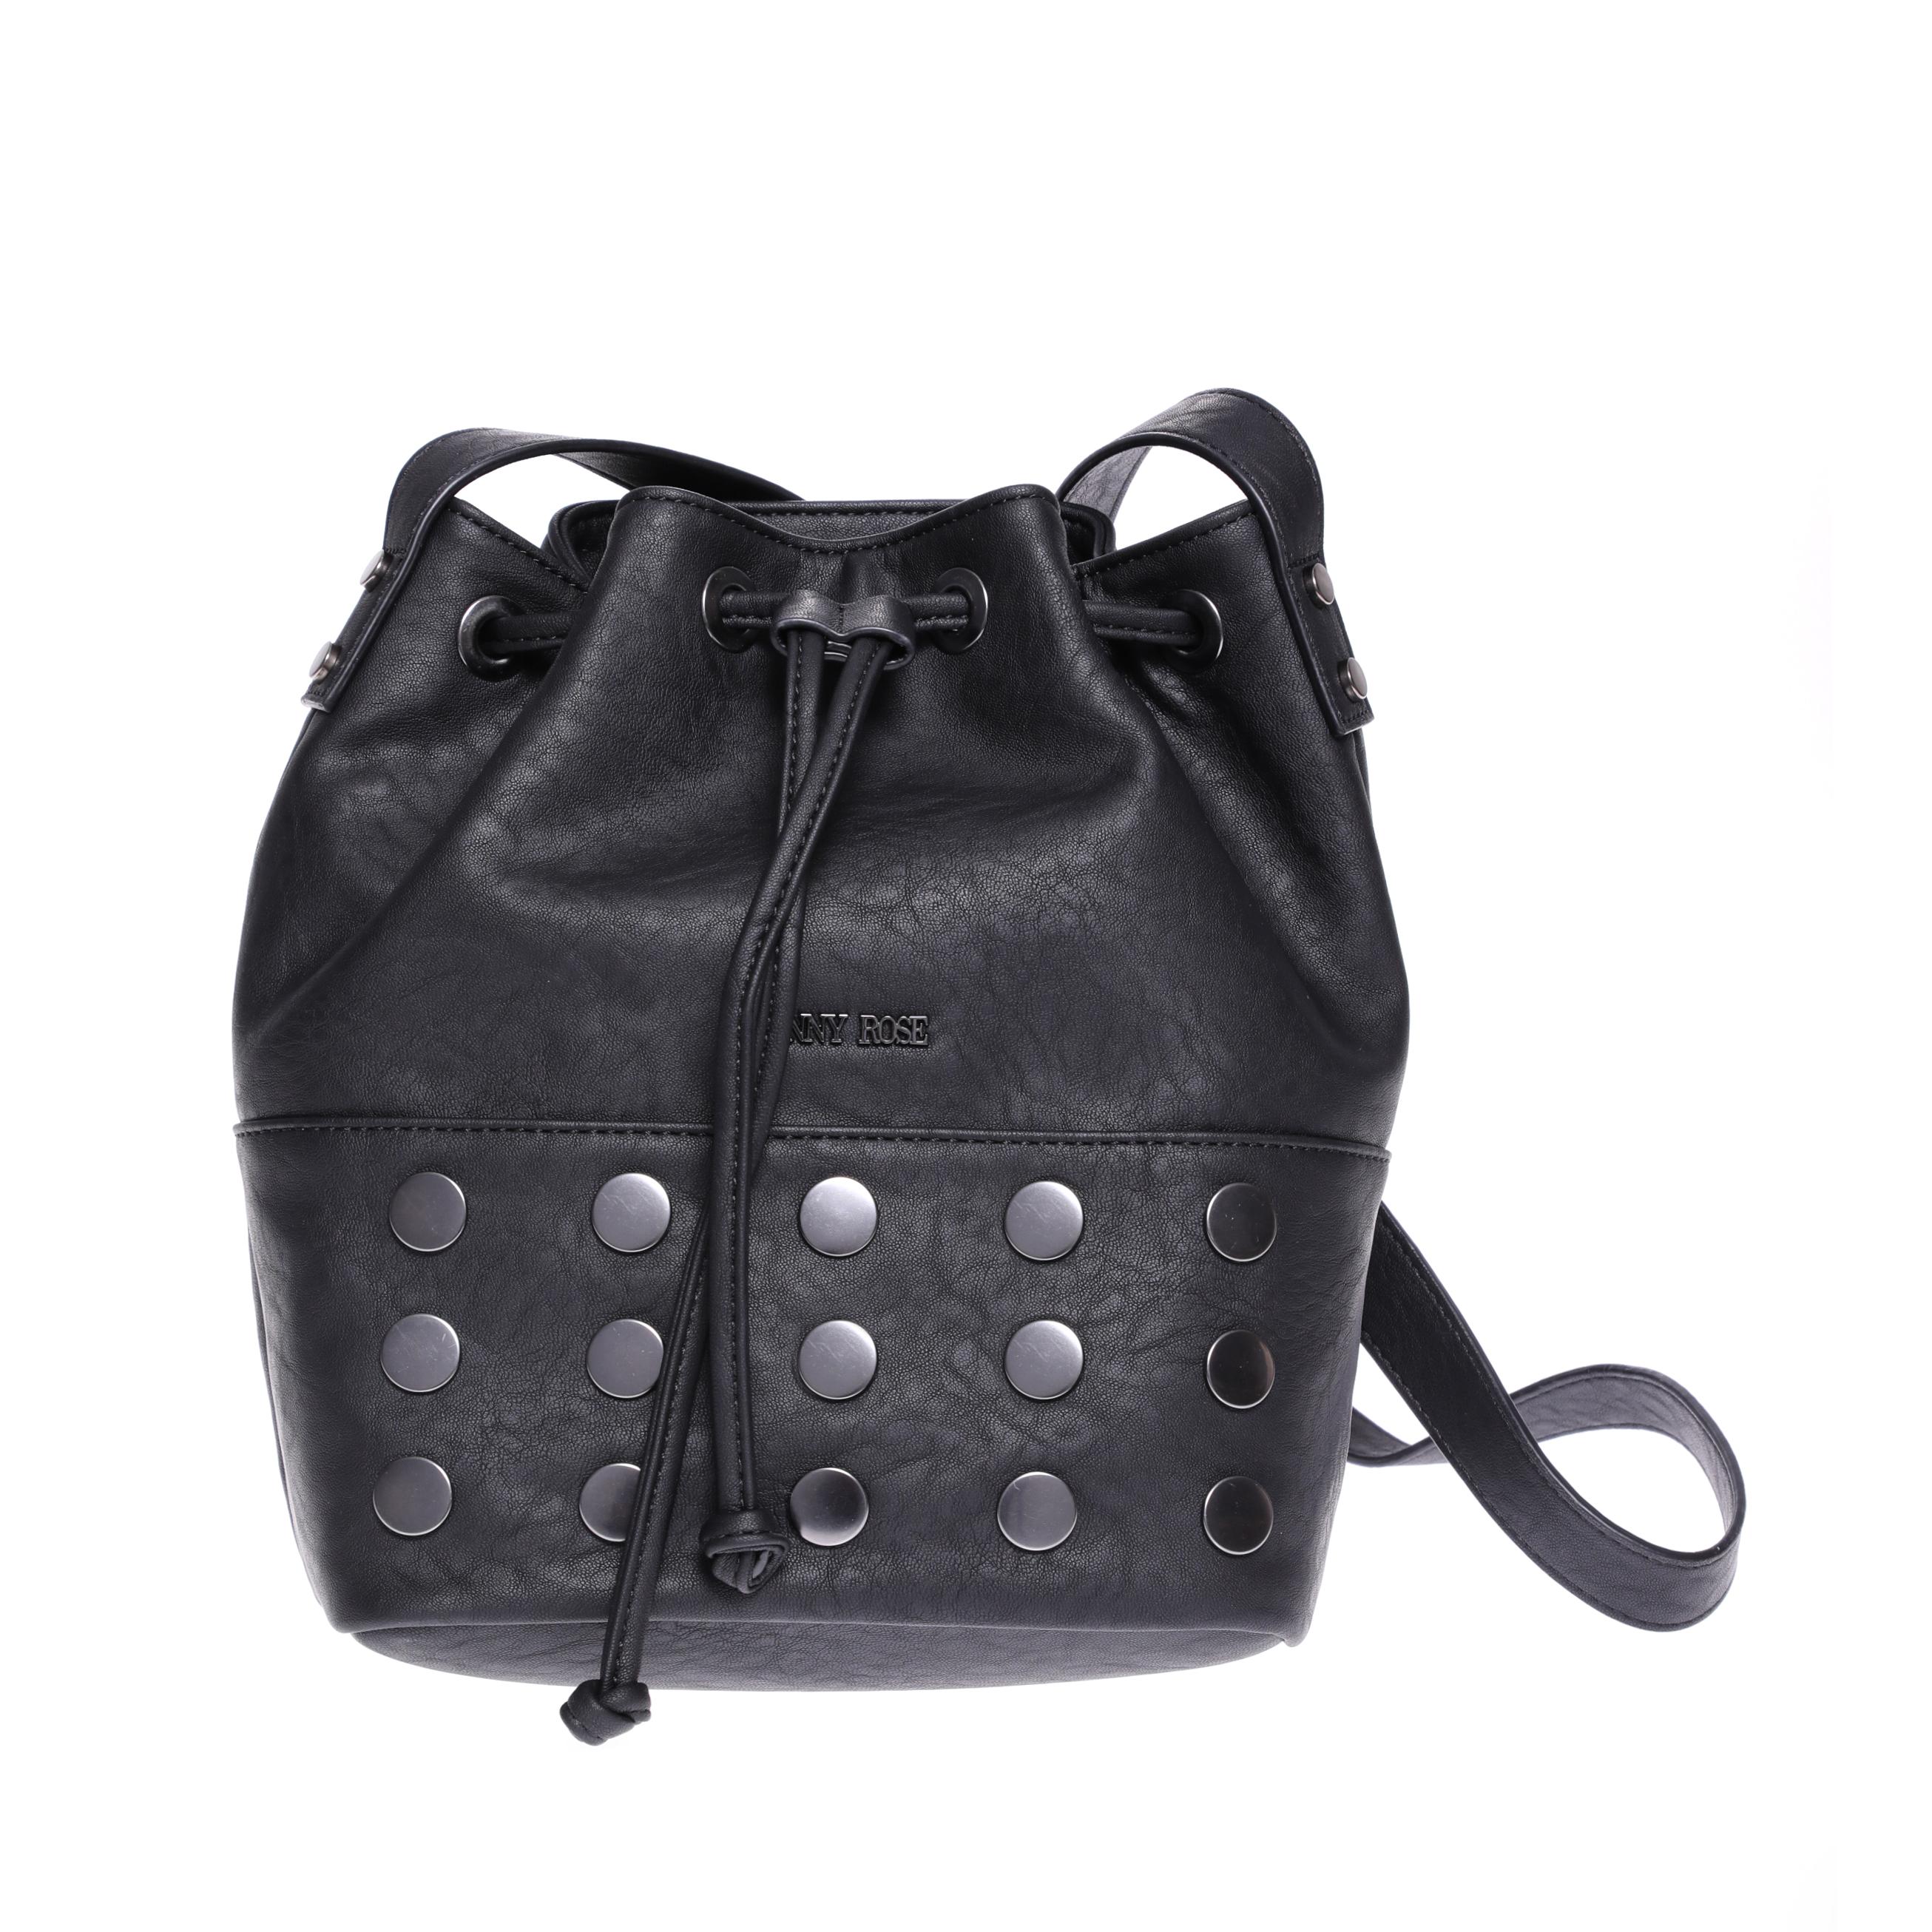 DENNY ROSE – Γυναικεία τσάντα Denny Rose μαύρη 1596979.0-0071